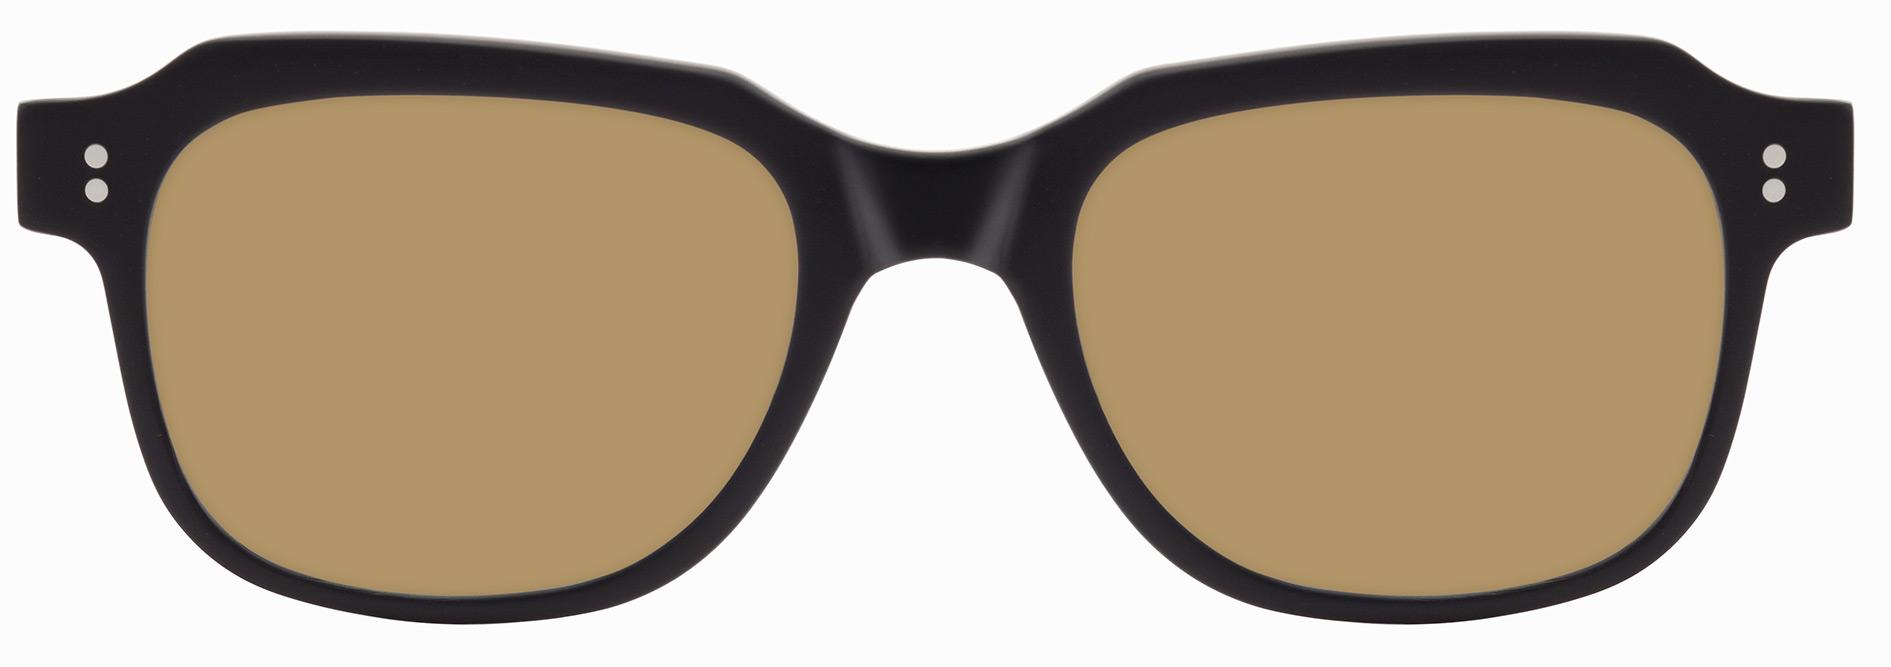 moscot-eyewear-ss2013-21